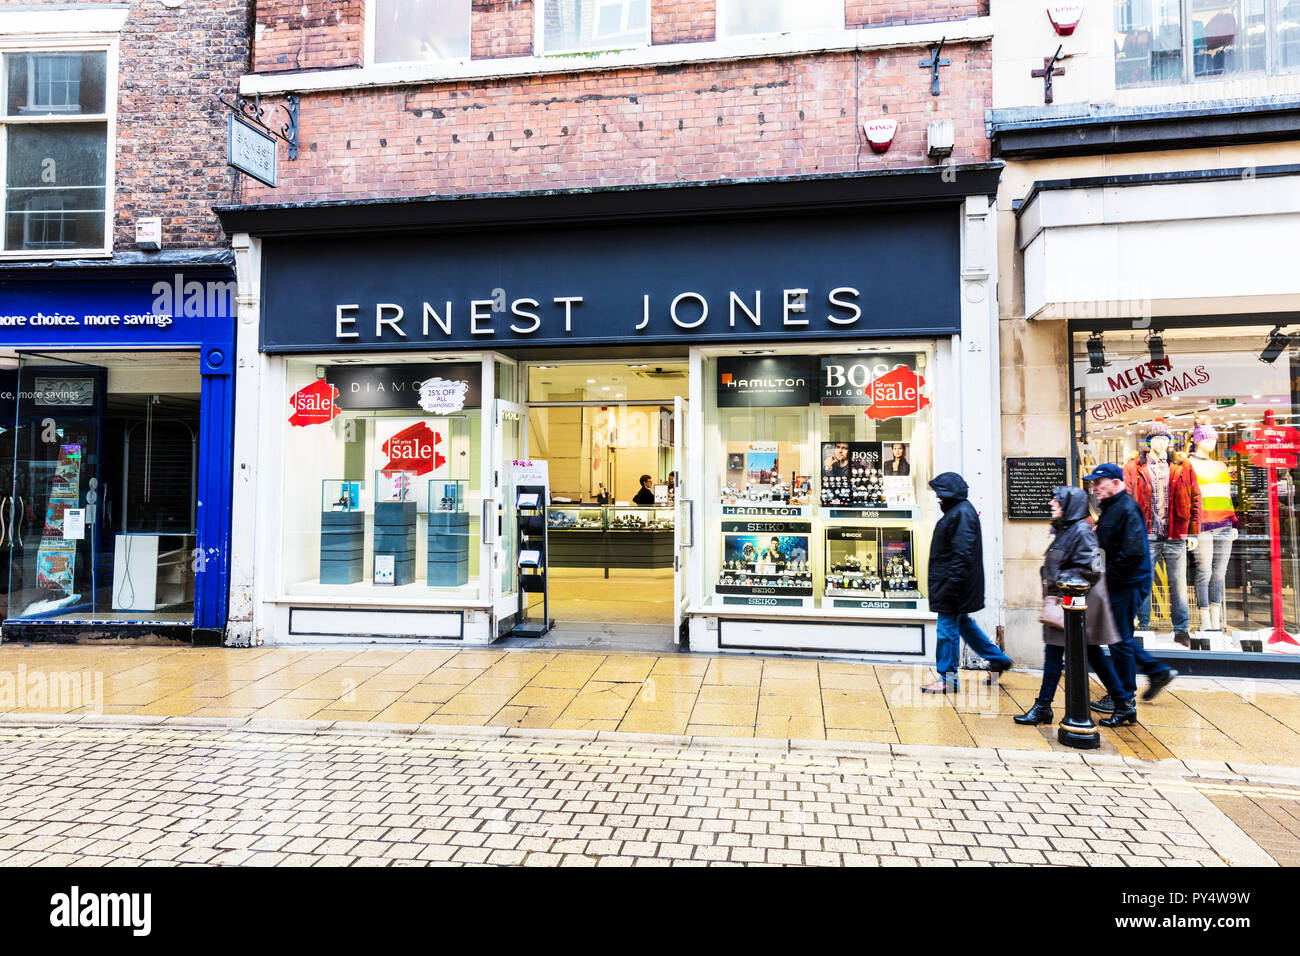 Ernest Jones Jewelers, Ernest Jones jewellery store, Ernest Jones jewellery shop, Ernest Jones high street shop, jewellery shops,  jewellery stores Stock Photo